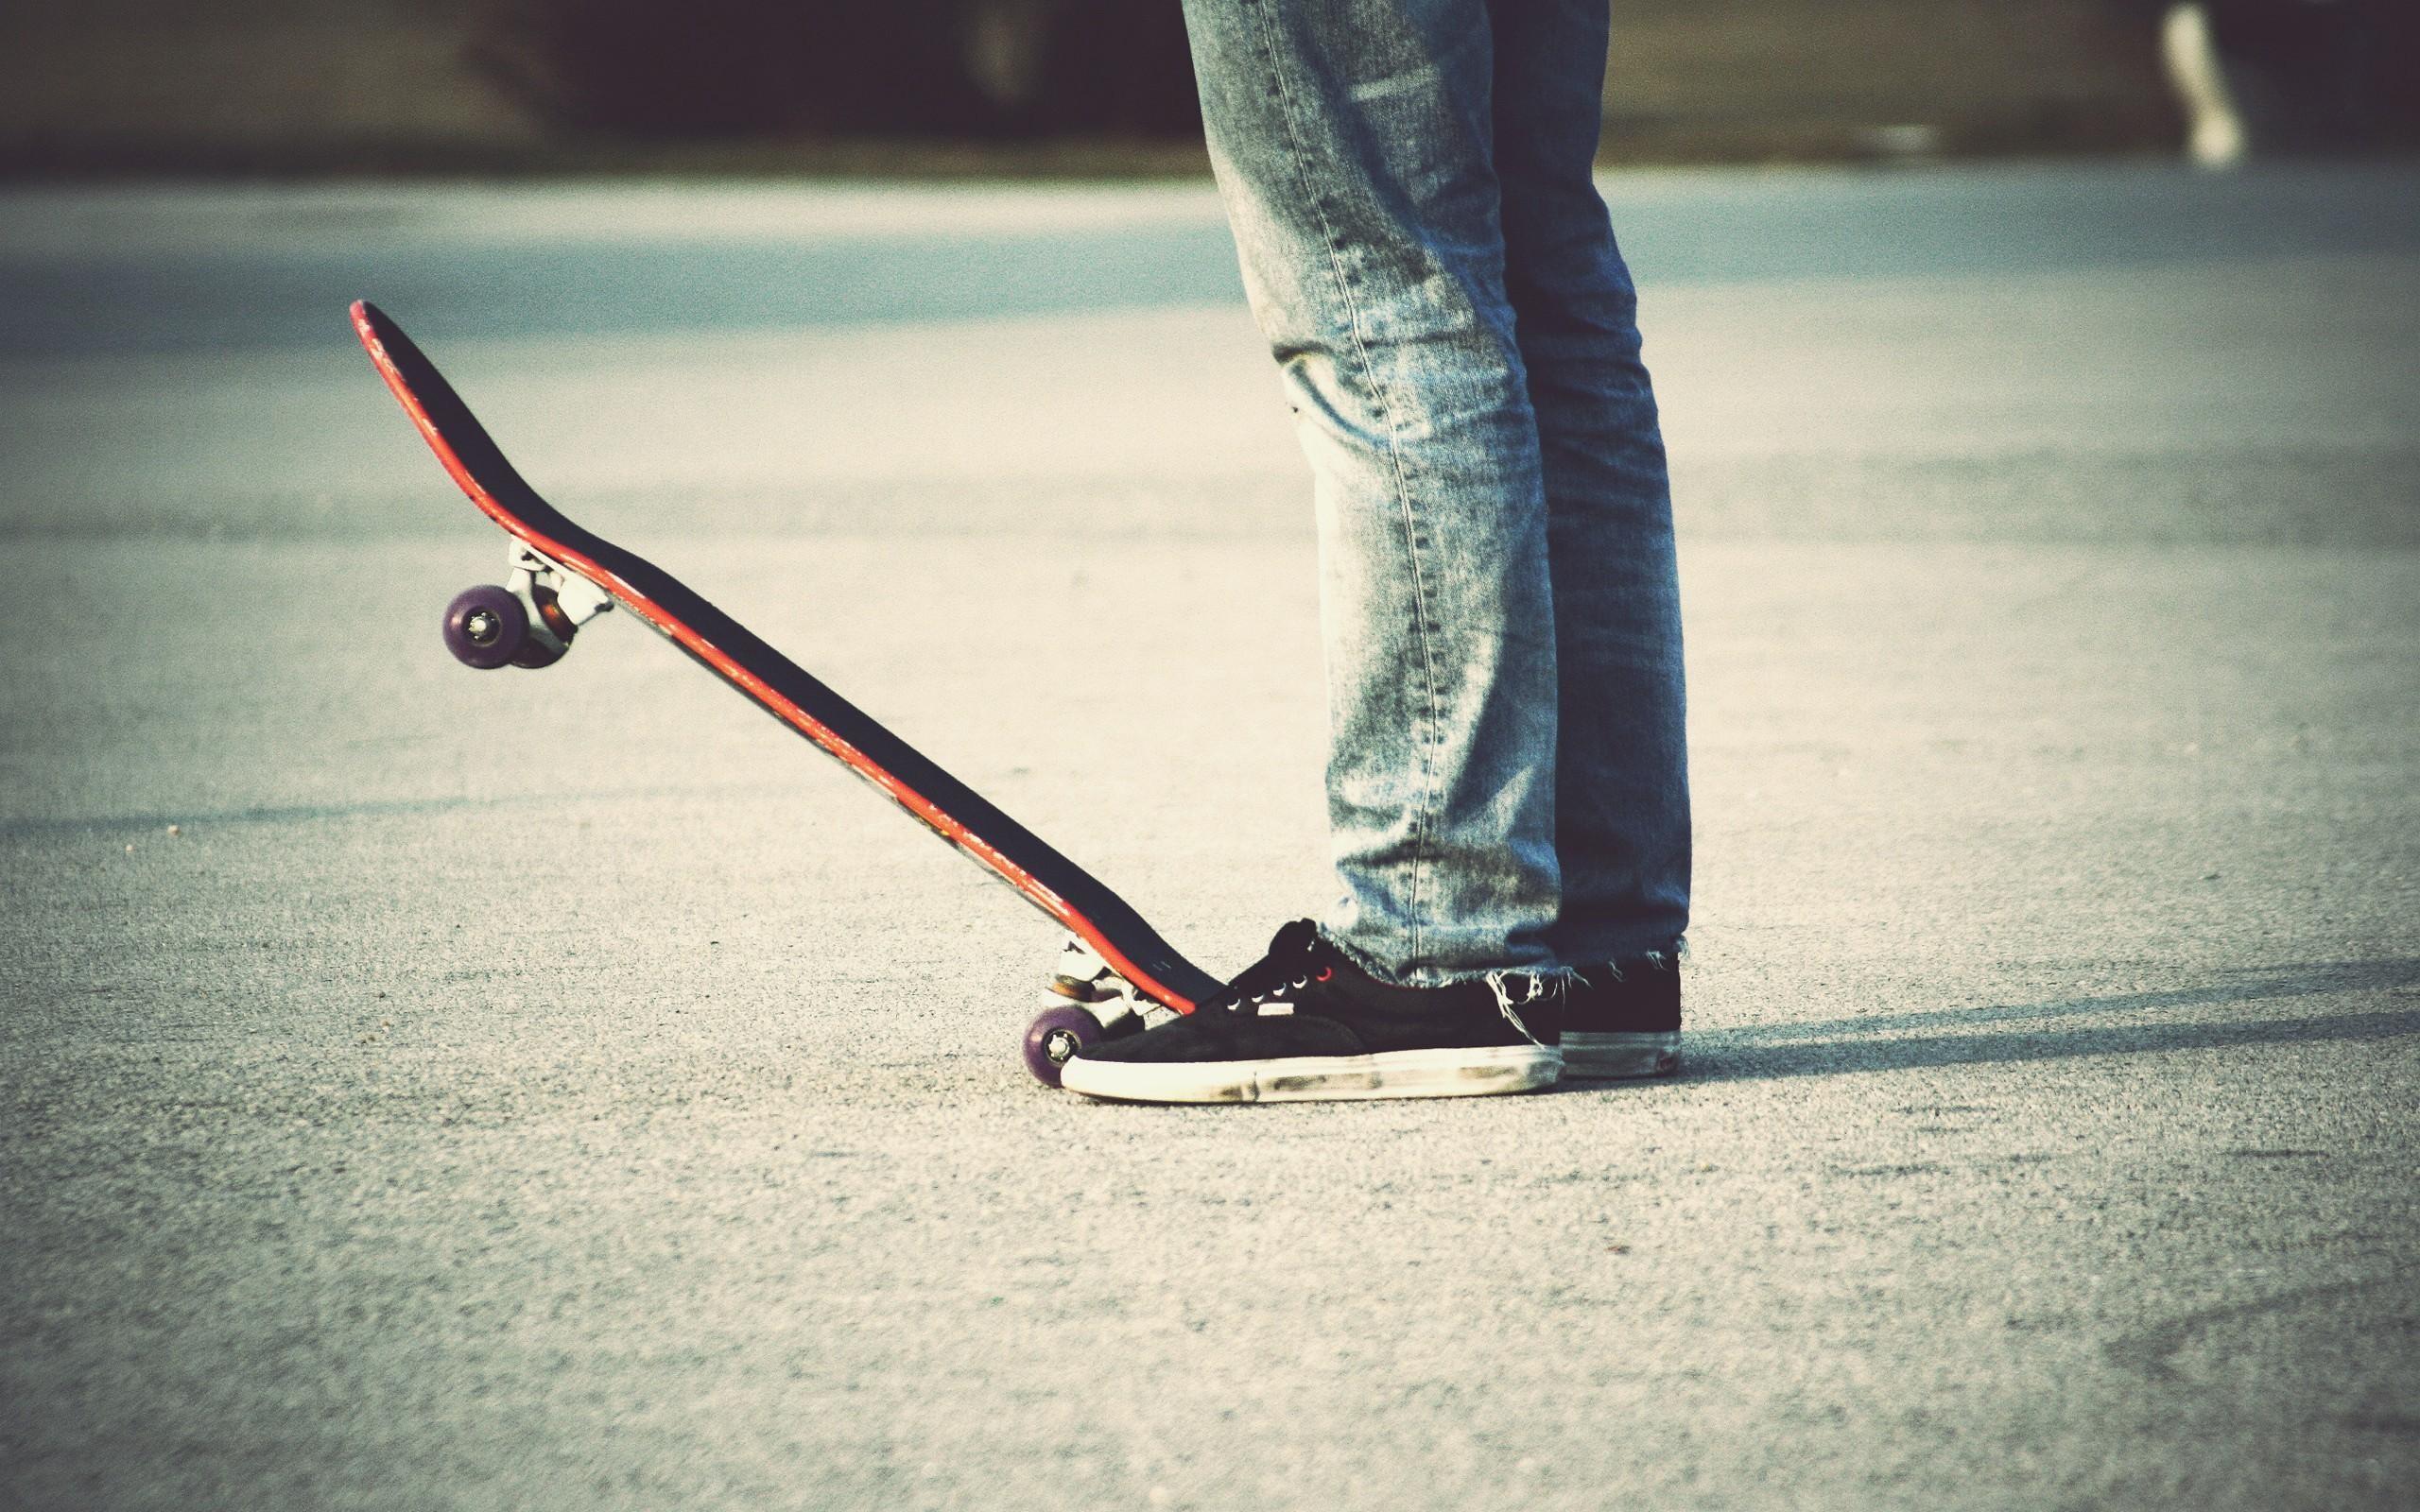 2560x1600 Vans Skateboard Wallpapers Hd Resolution 55 Download Skateboarding